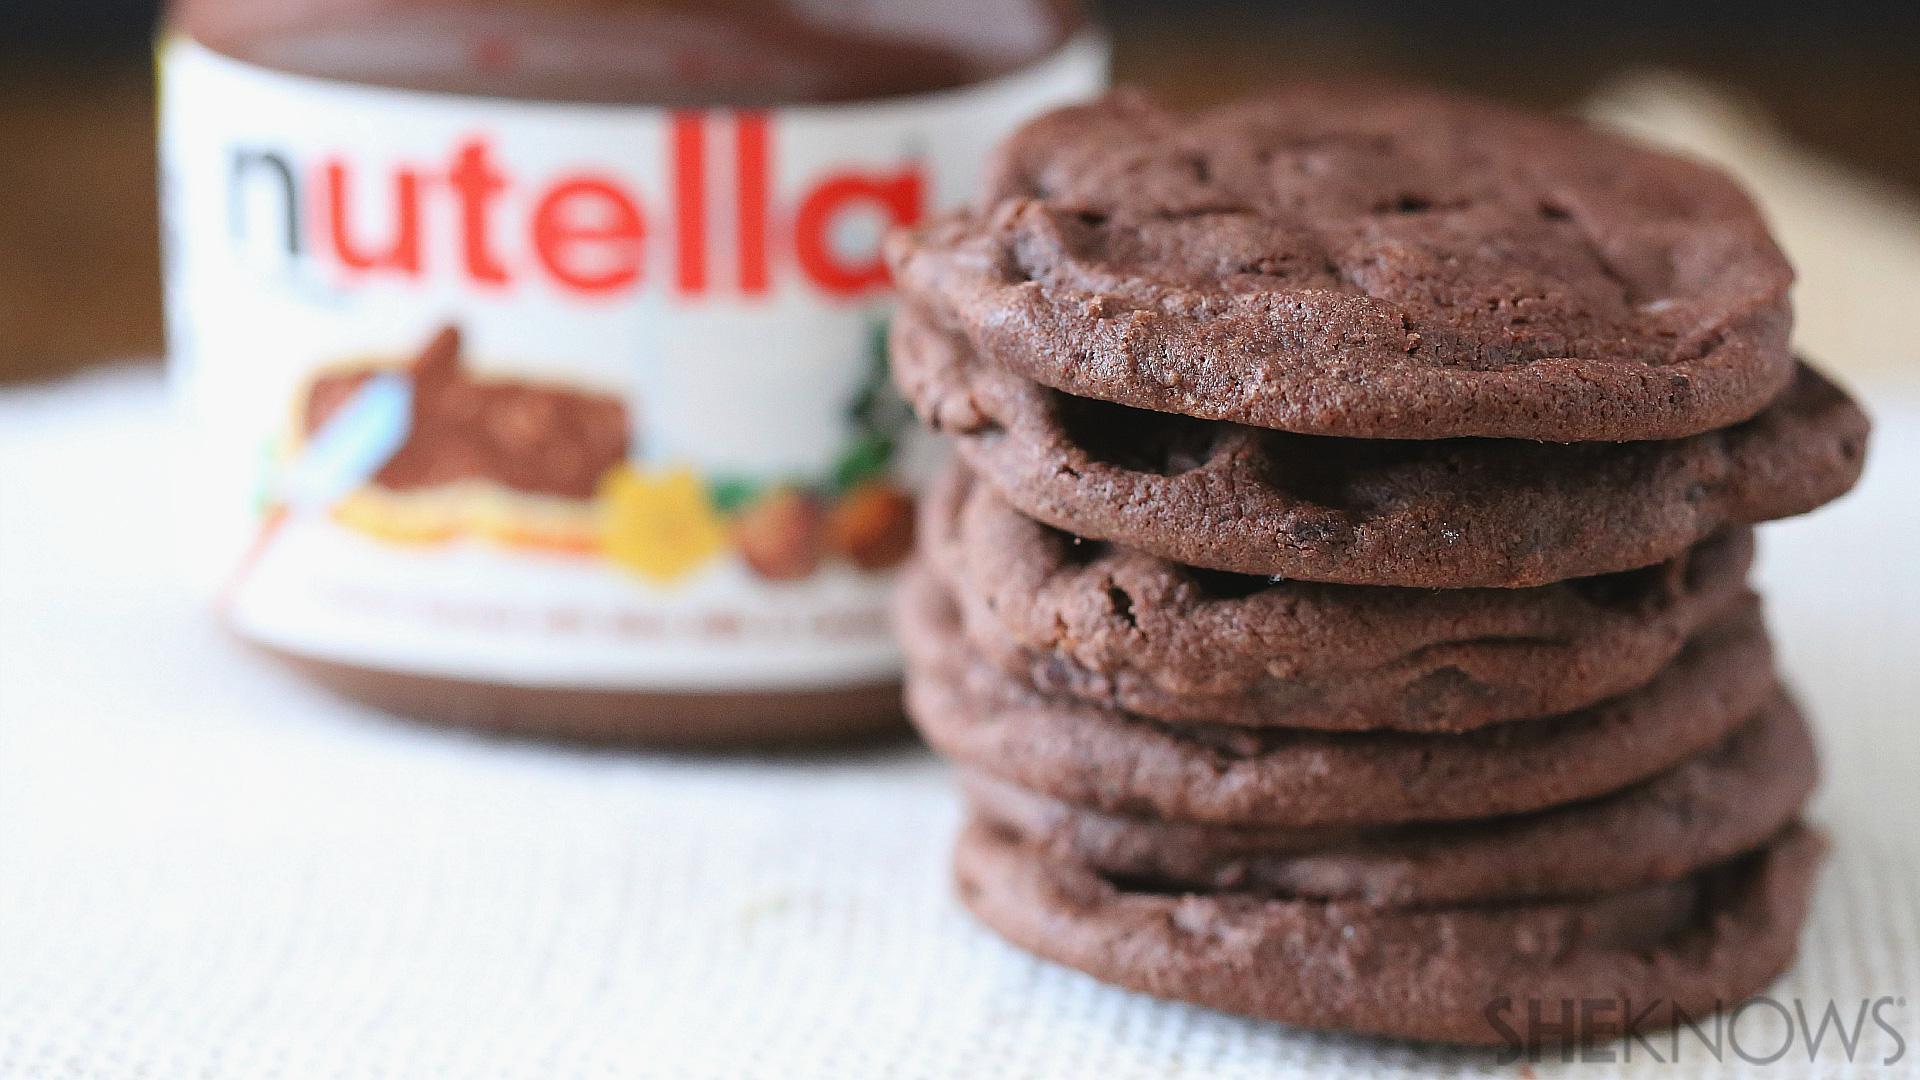 Easy Nutella Dessert  3 ingre nt Nutella cookies almost as easy as eating it